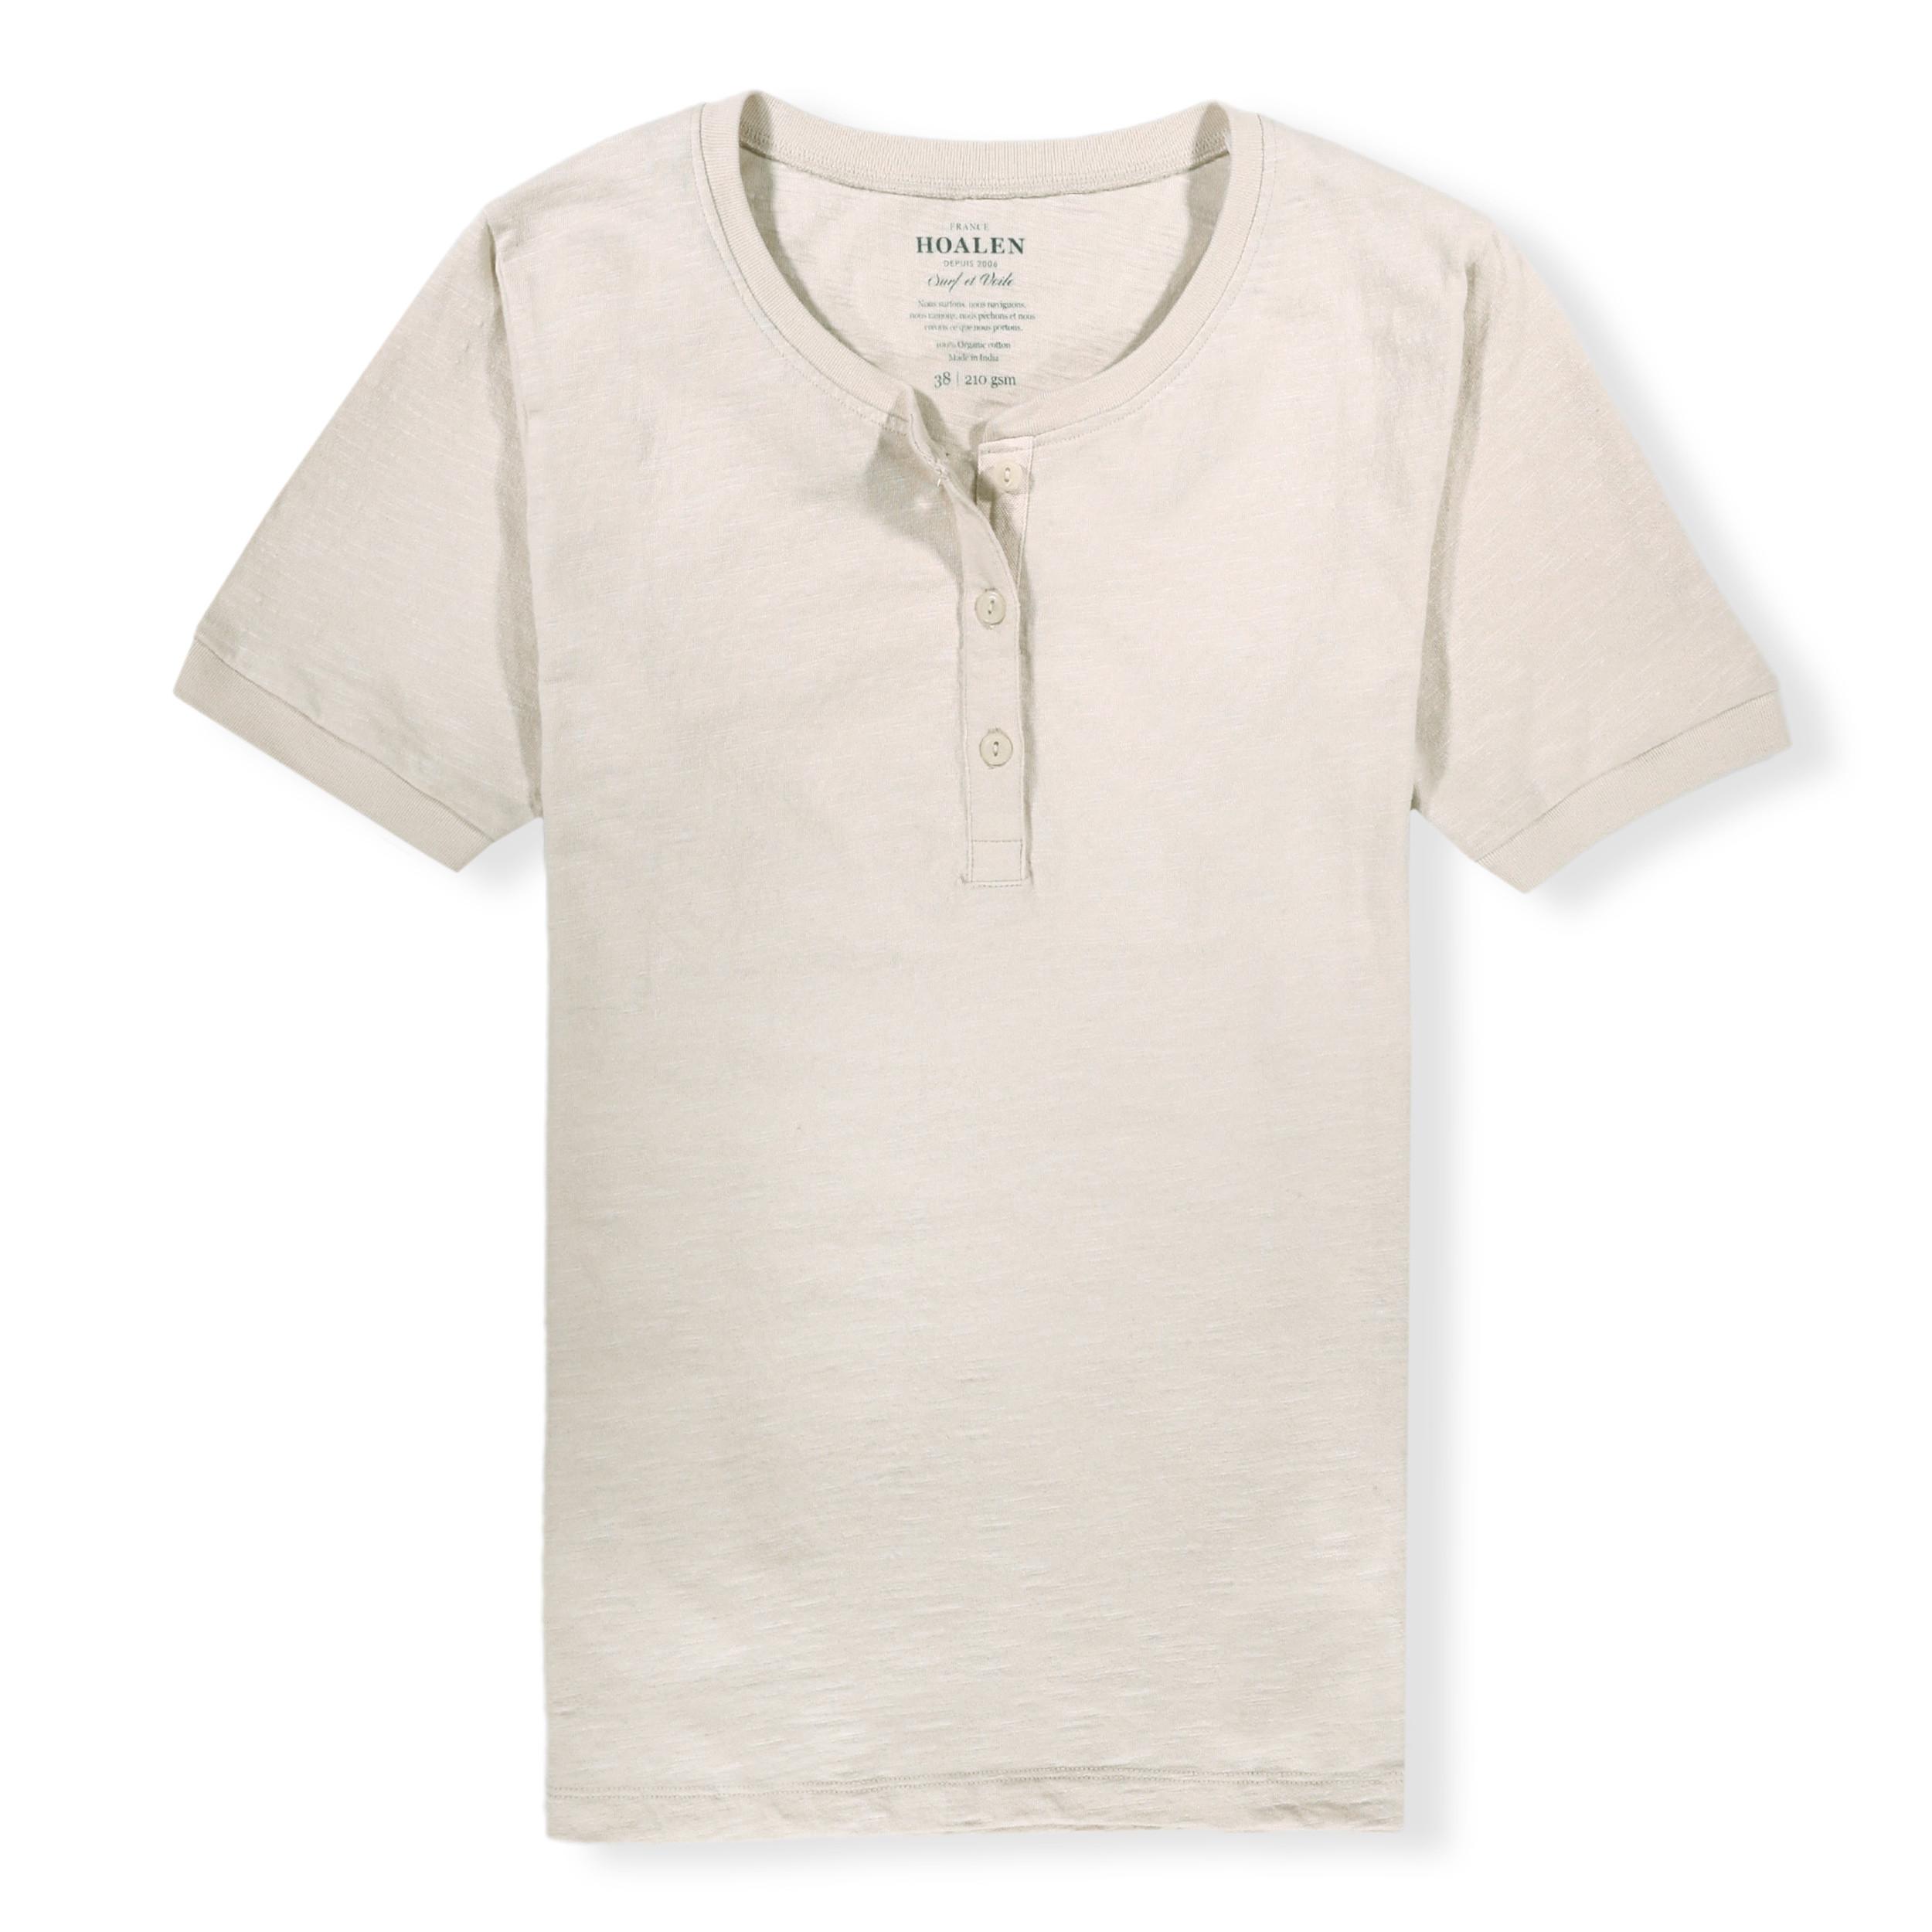 T-shirt épais